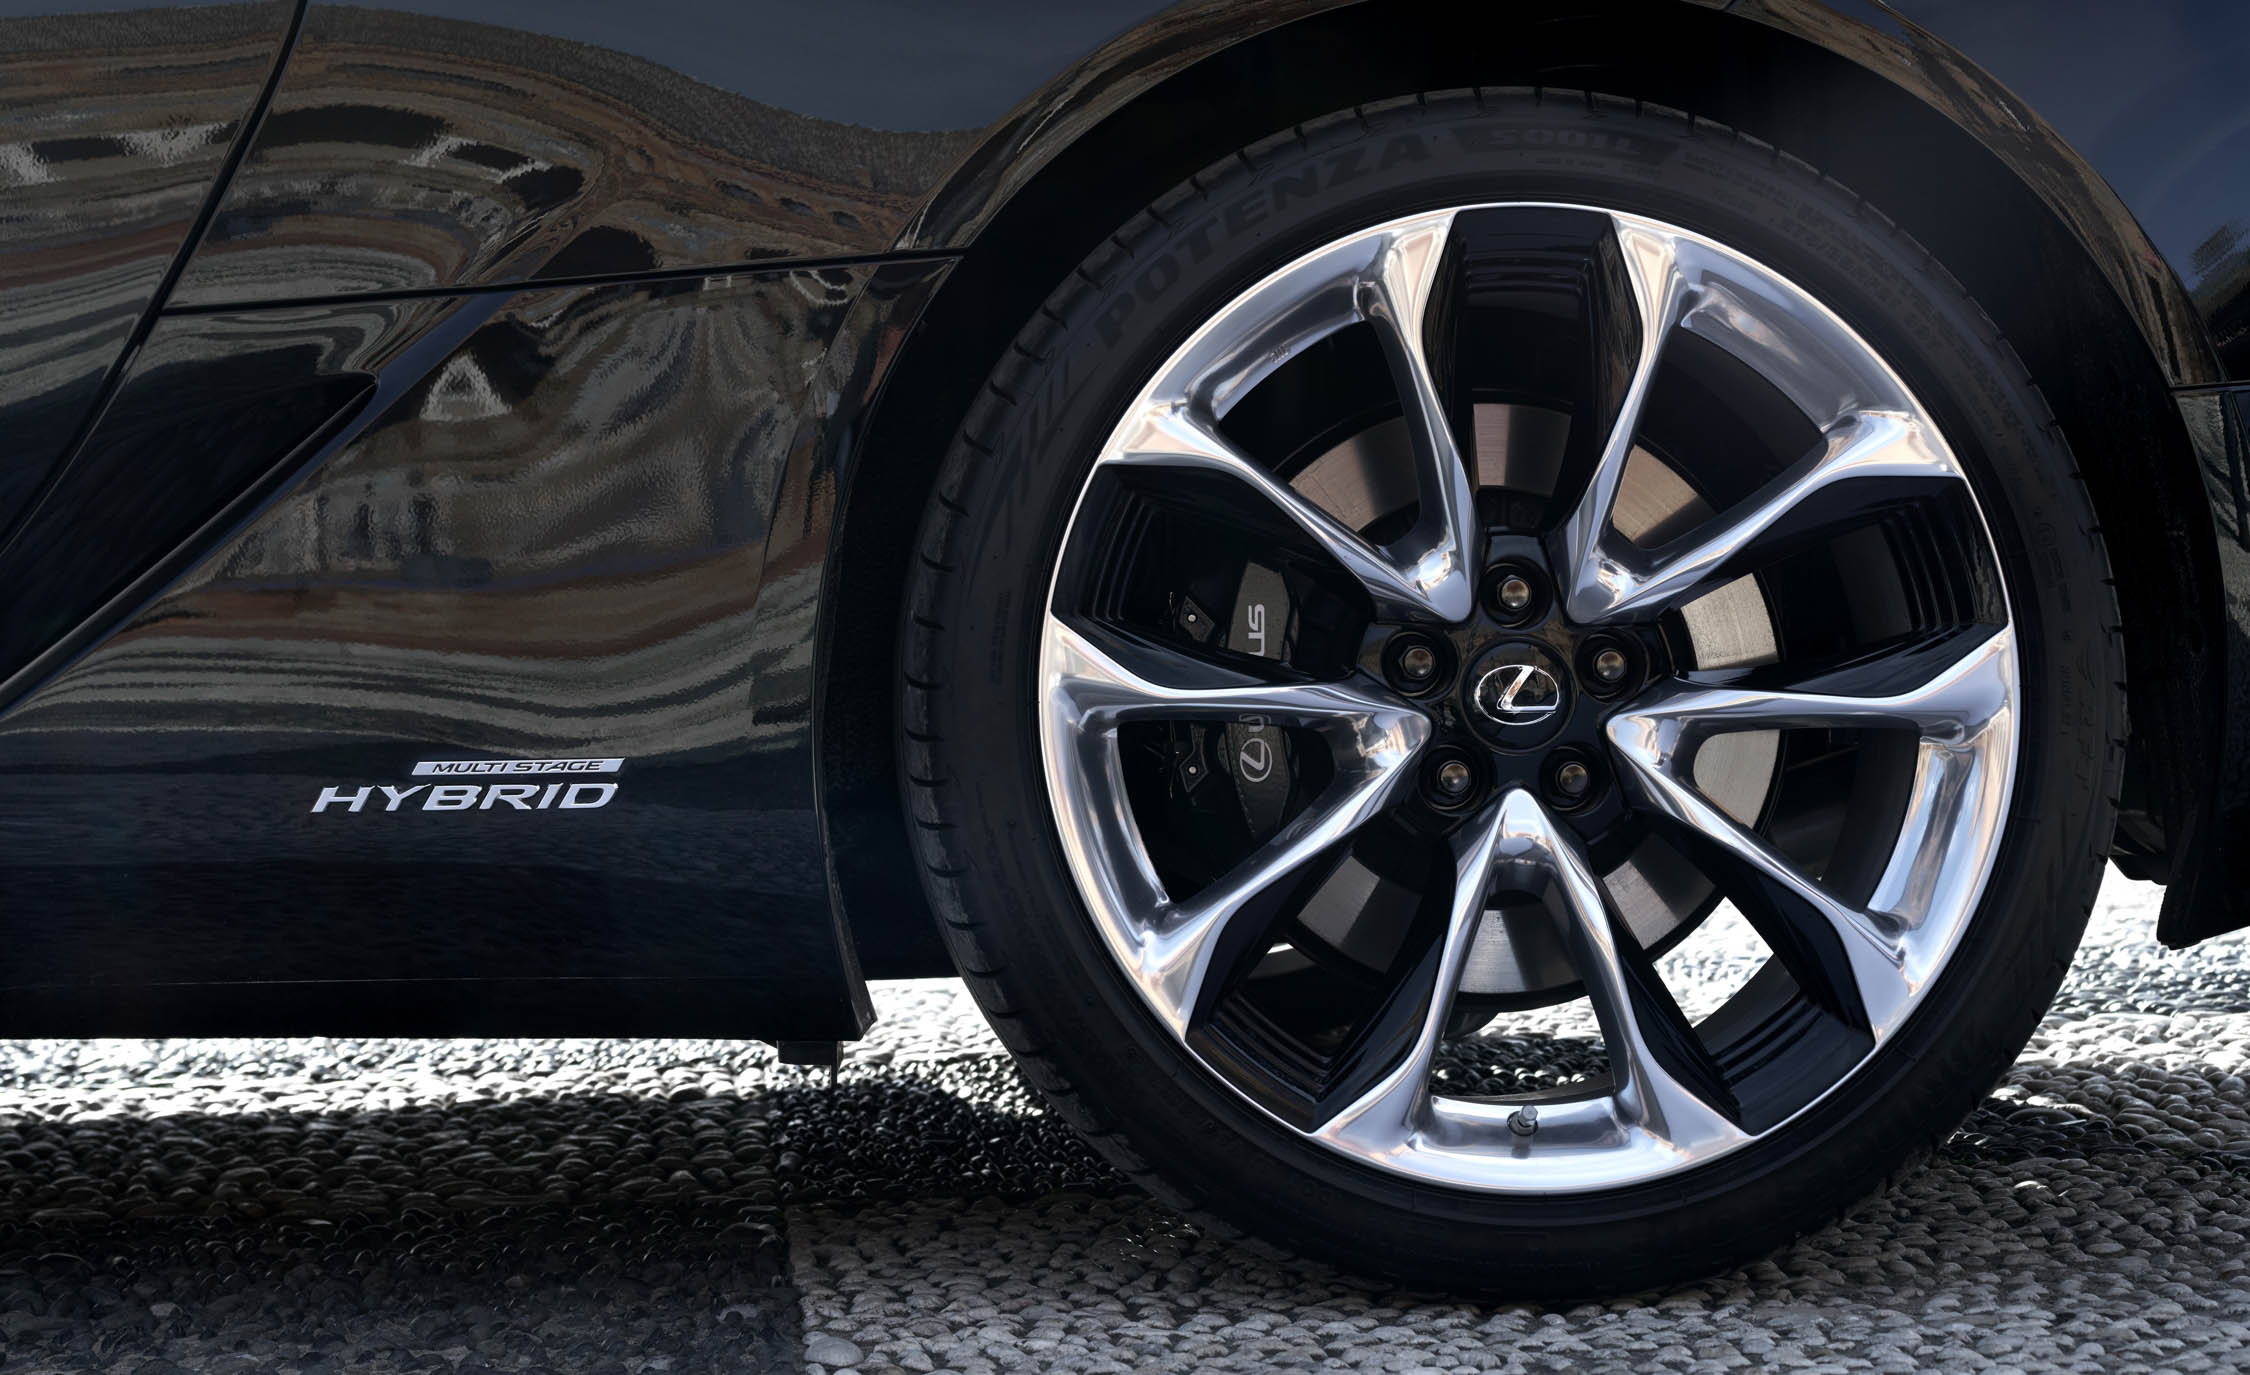 2018 Lexus Lc 500h Exterior View Wheel Trim (Photo 33 of 84)